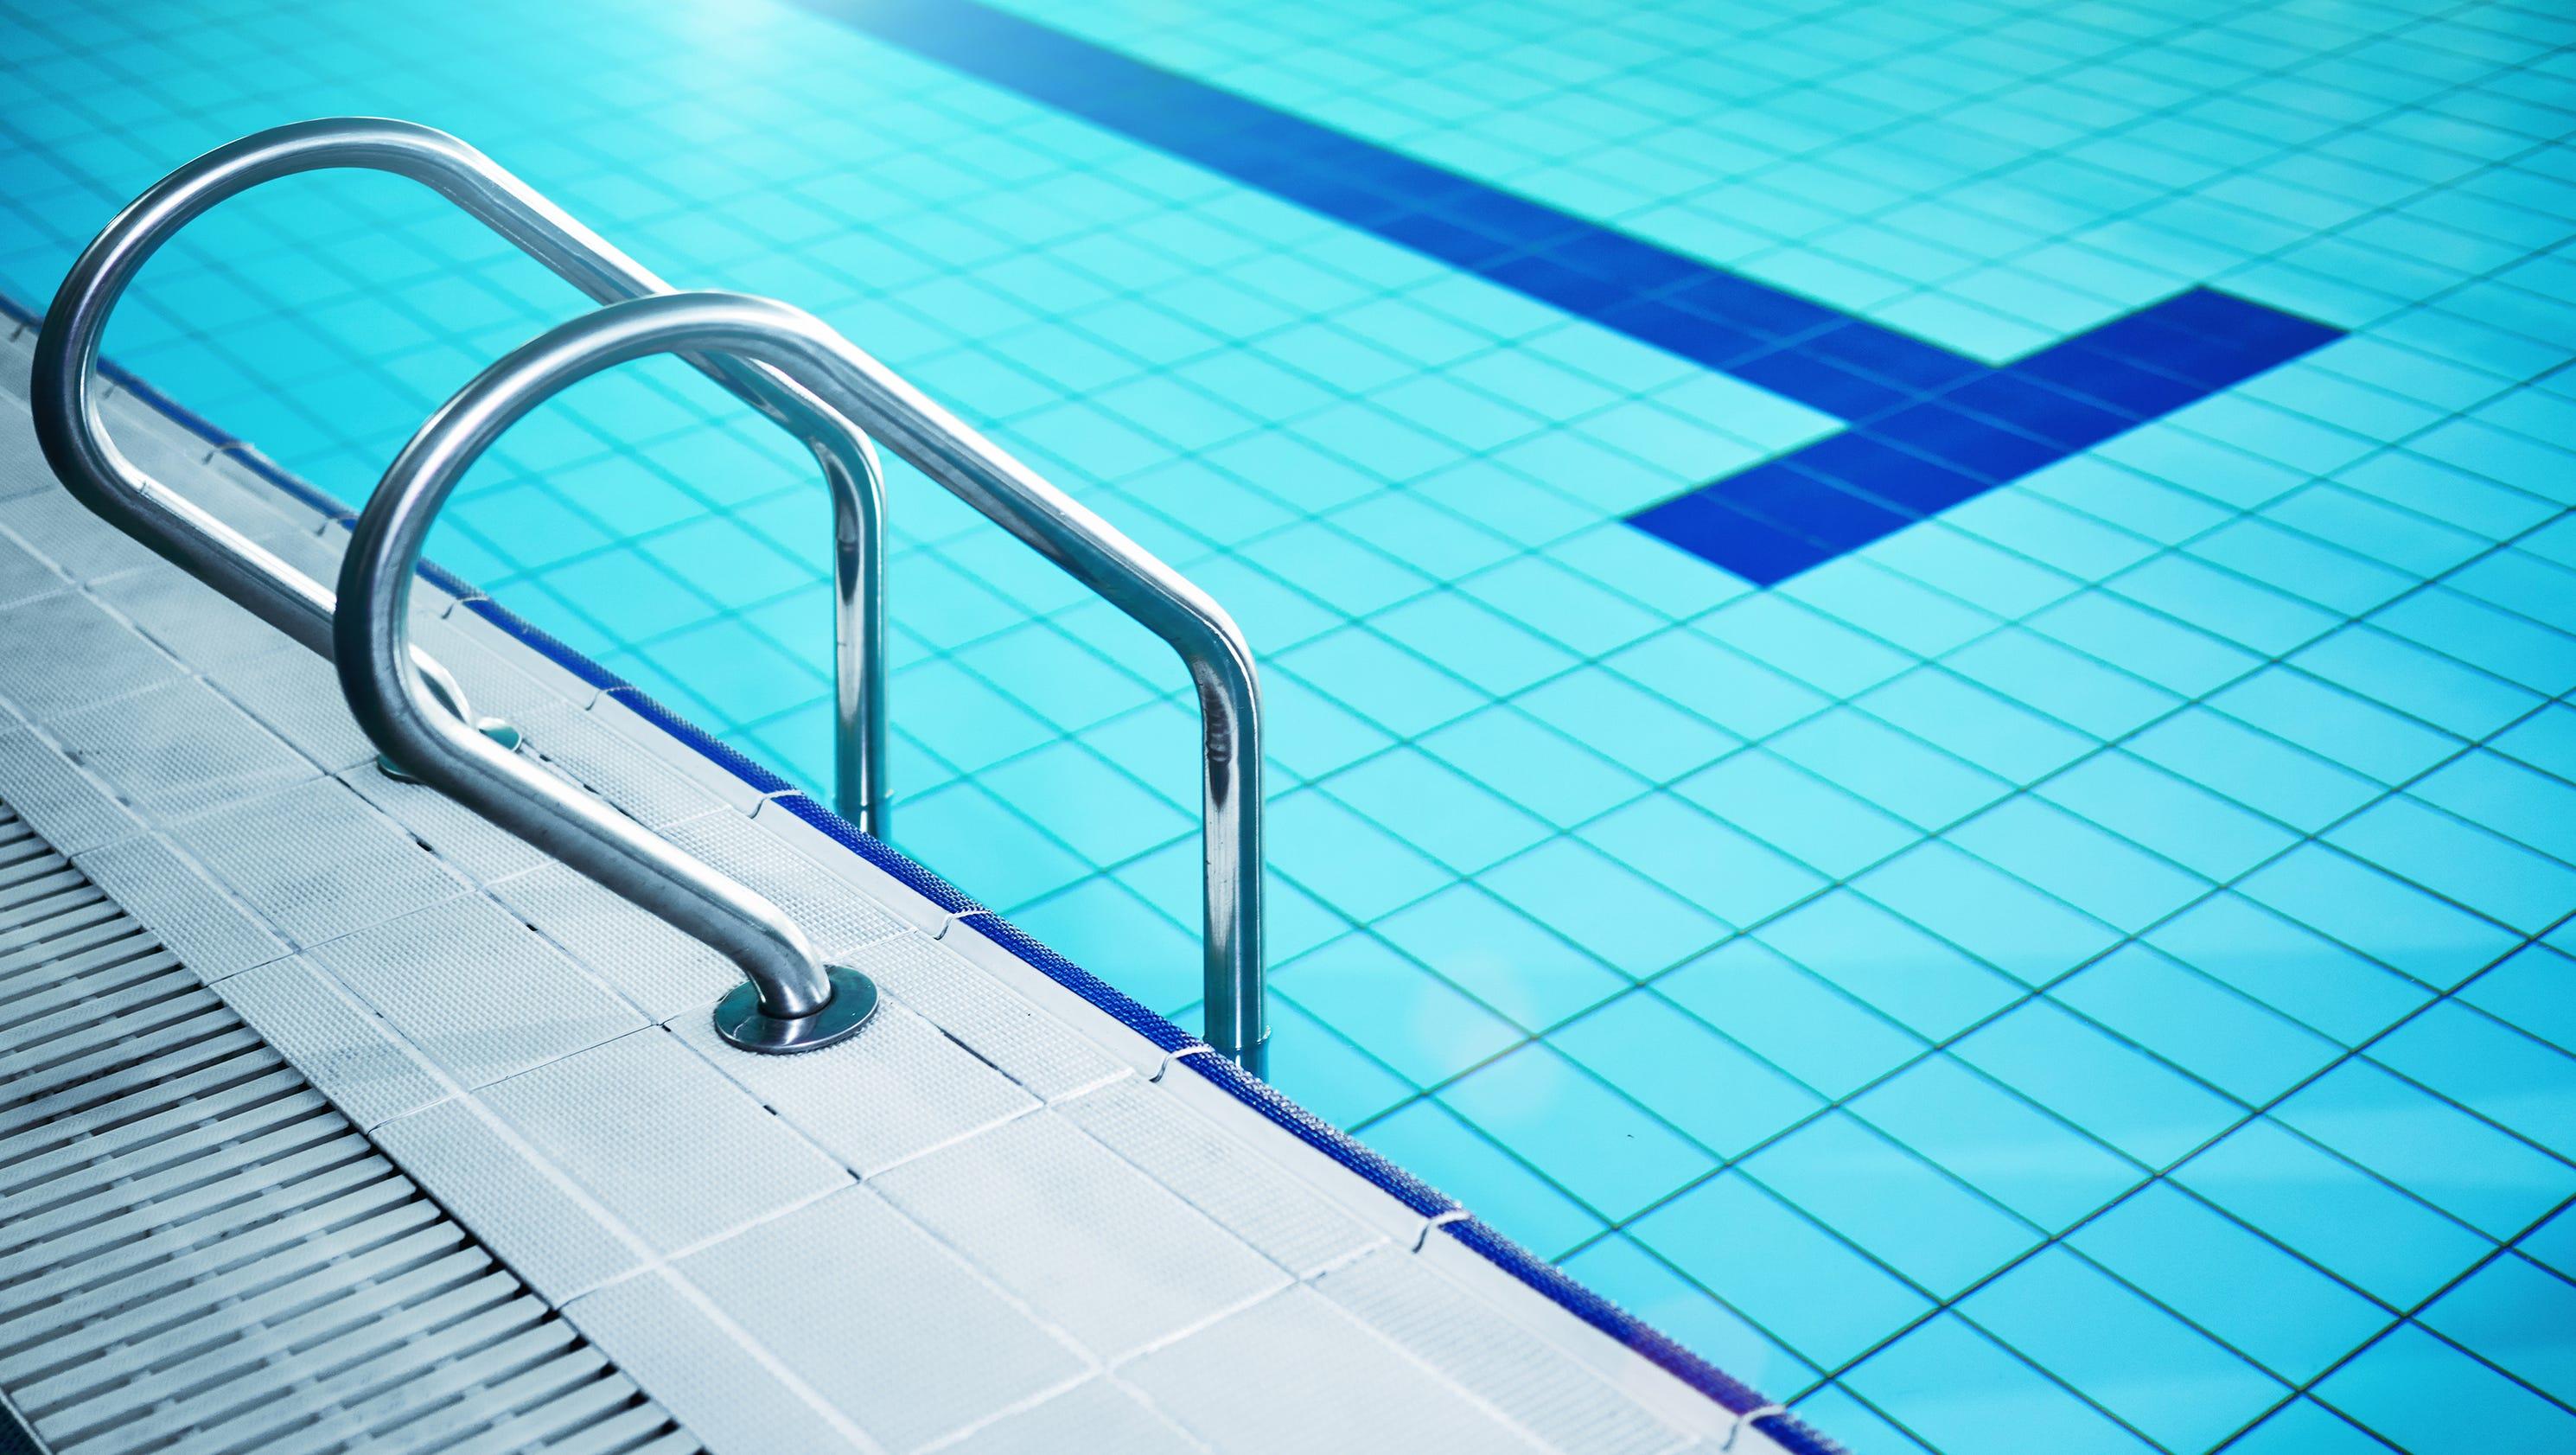 Oregon hotel restaurant and swimming pool inspections now online for Swimming pool inspection report